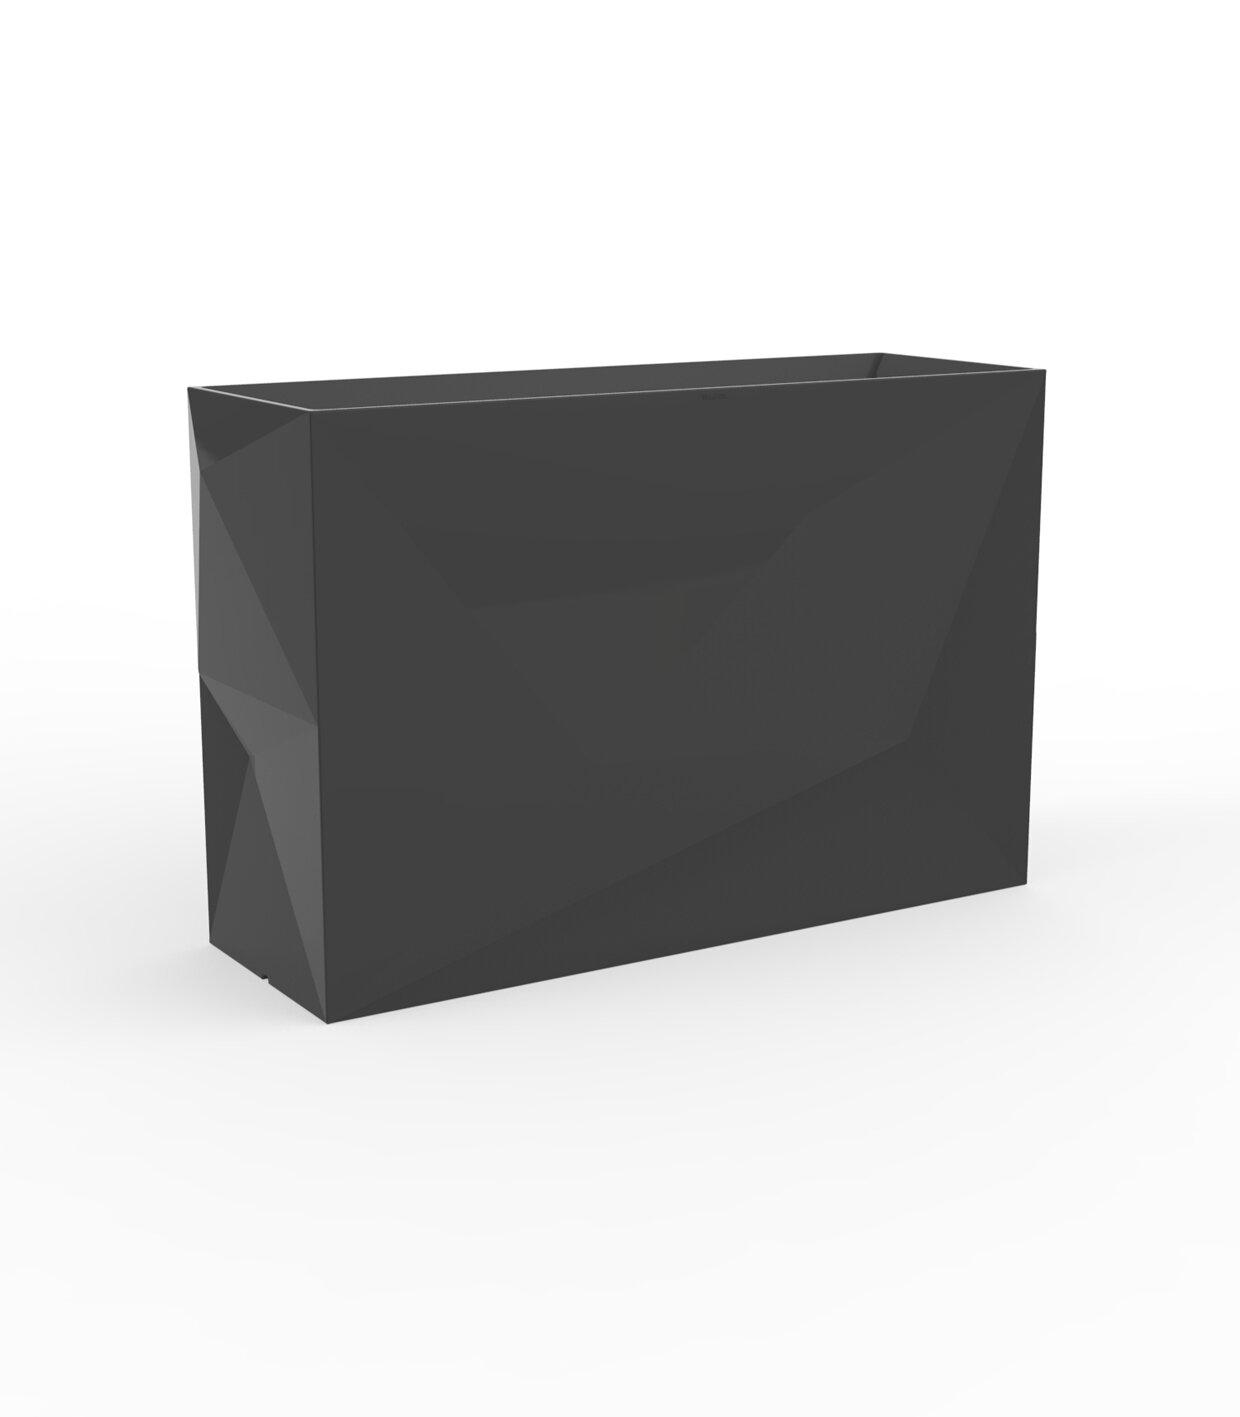 Vondom Faz Self Watering Resin Planter Box Wayfair